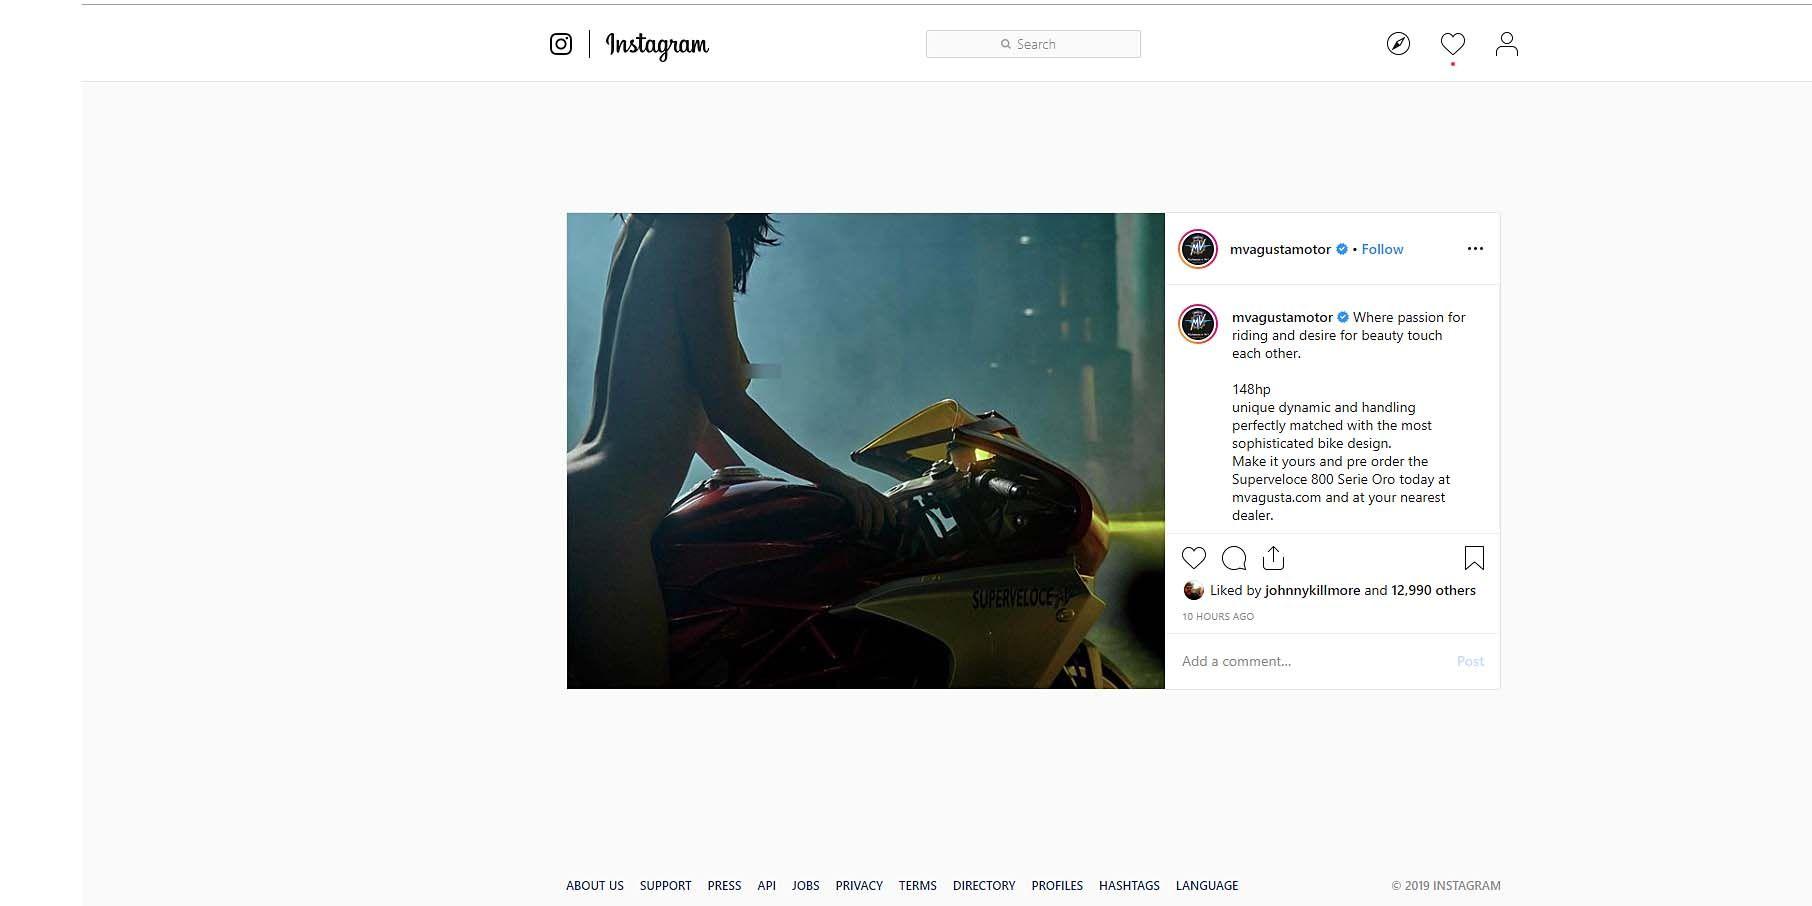 Sexist or Savvy? MV Agusta Superveloce 800 Post Lights Instagram on Fire